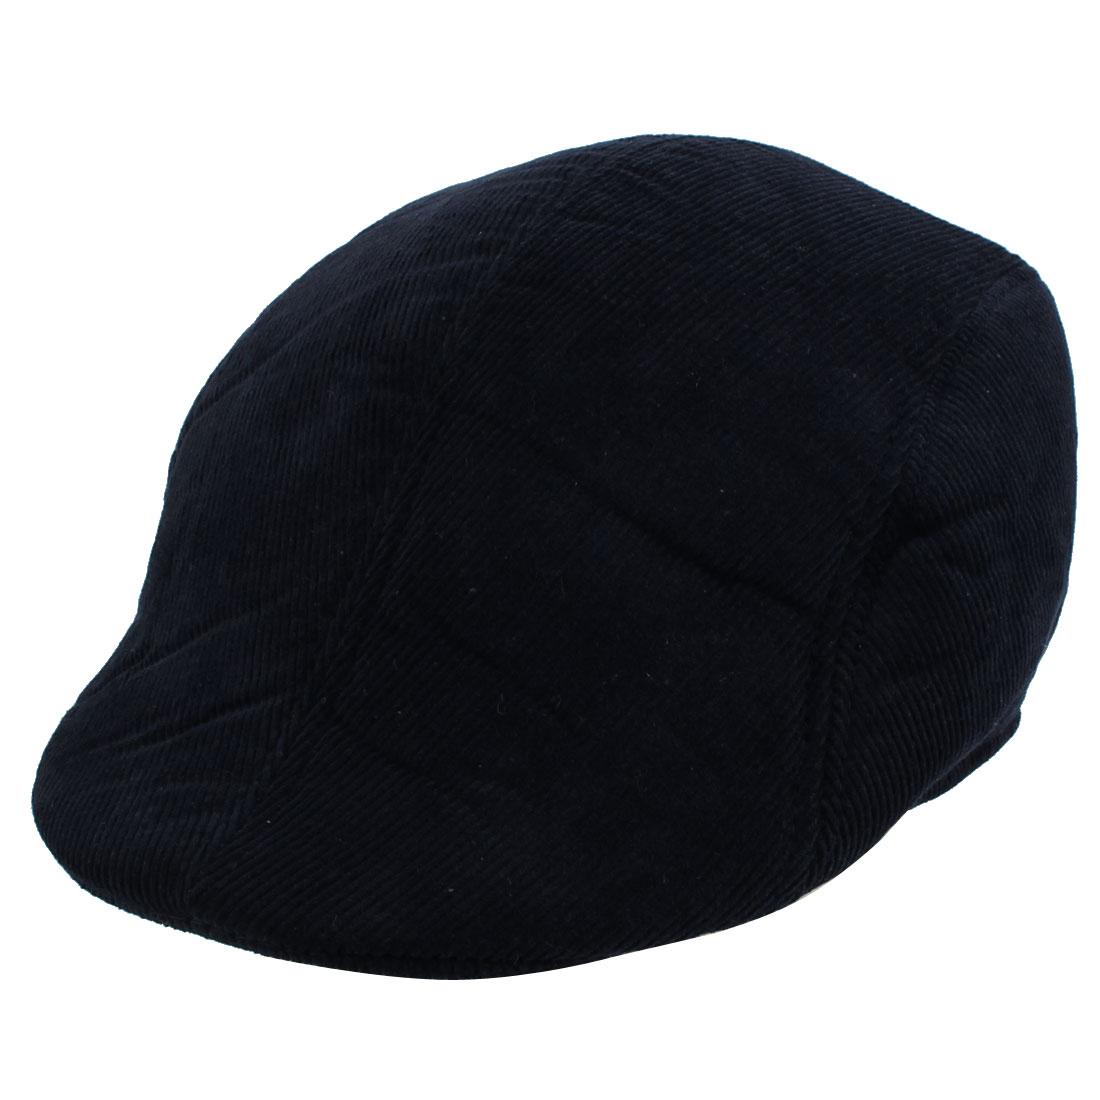 Corduroy Winter Warm Newsboy Ivy Cap Cabbie Driving Flat Beret Hat Navy Blue